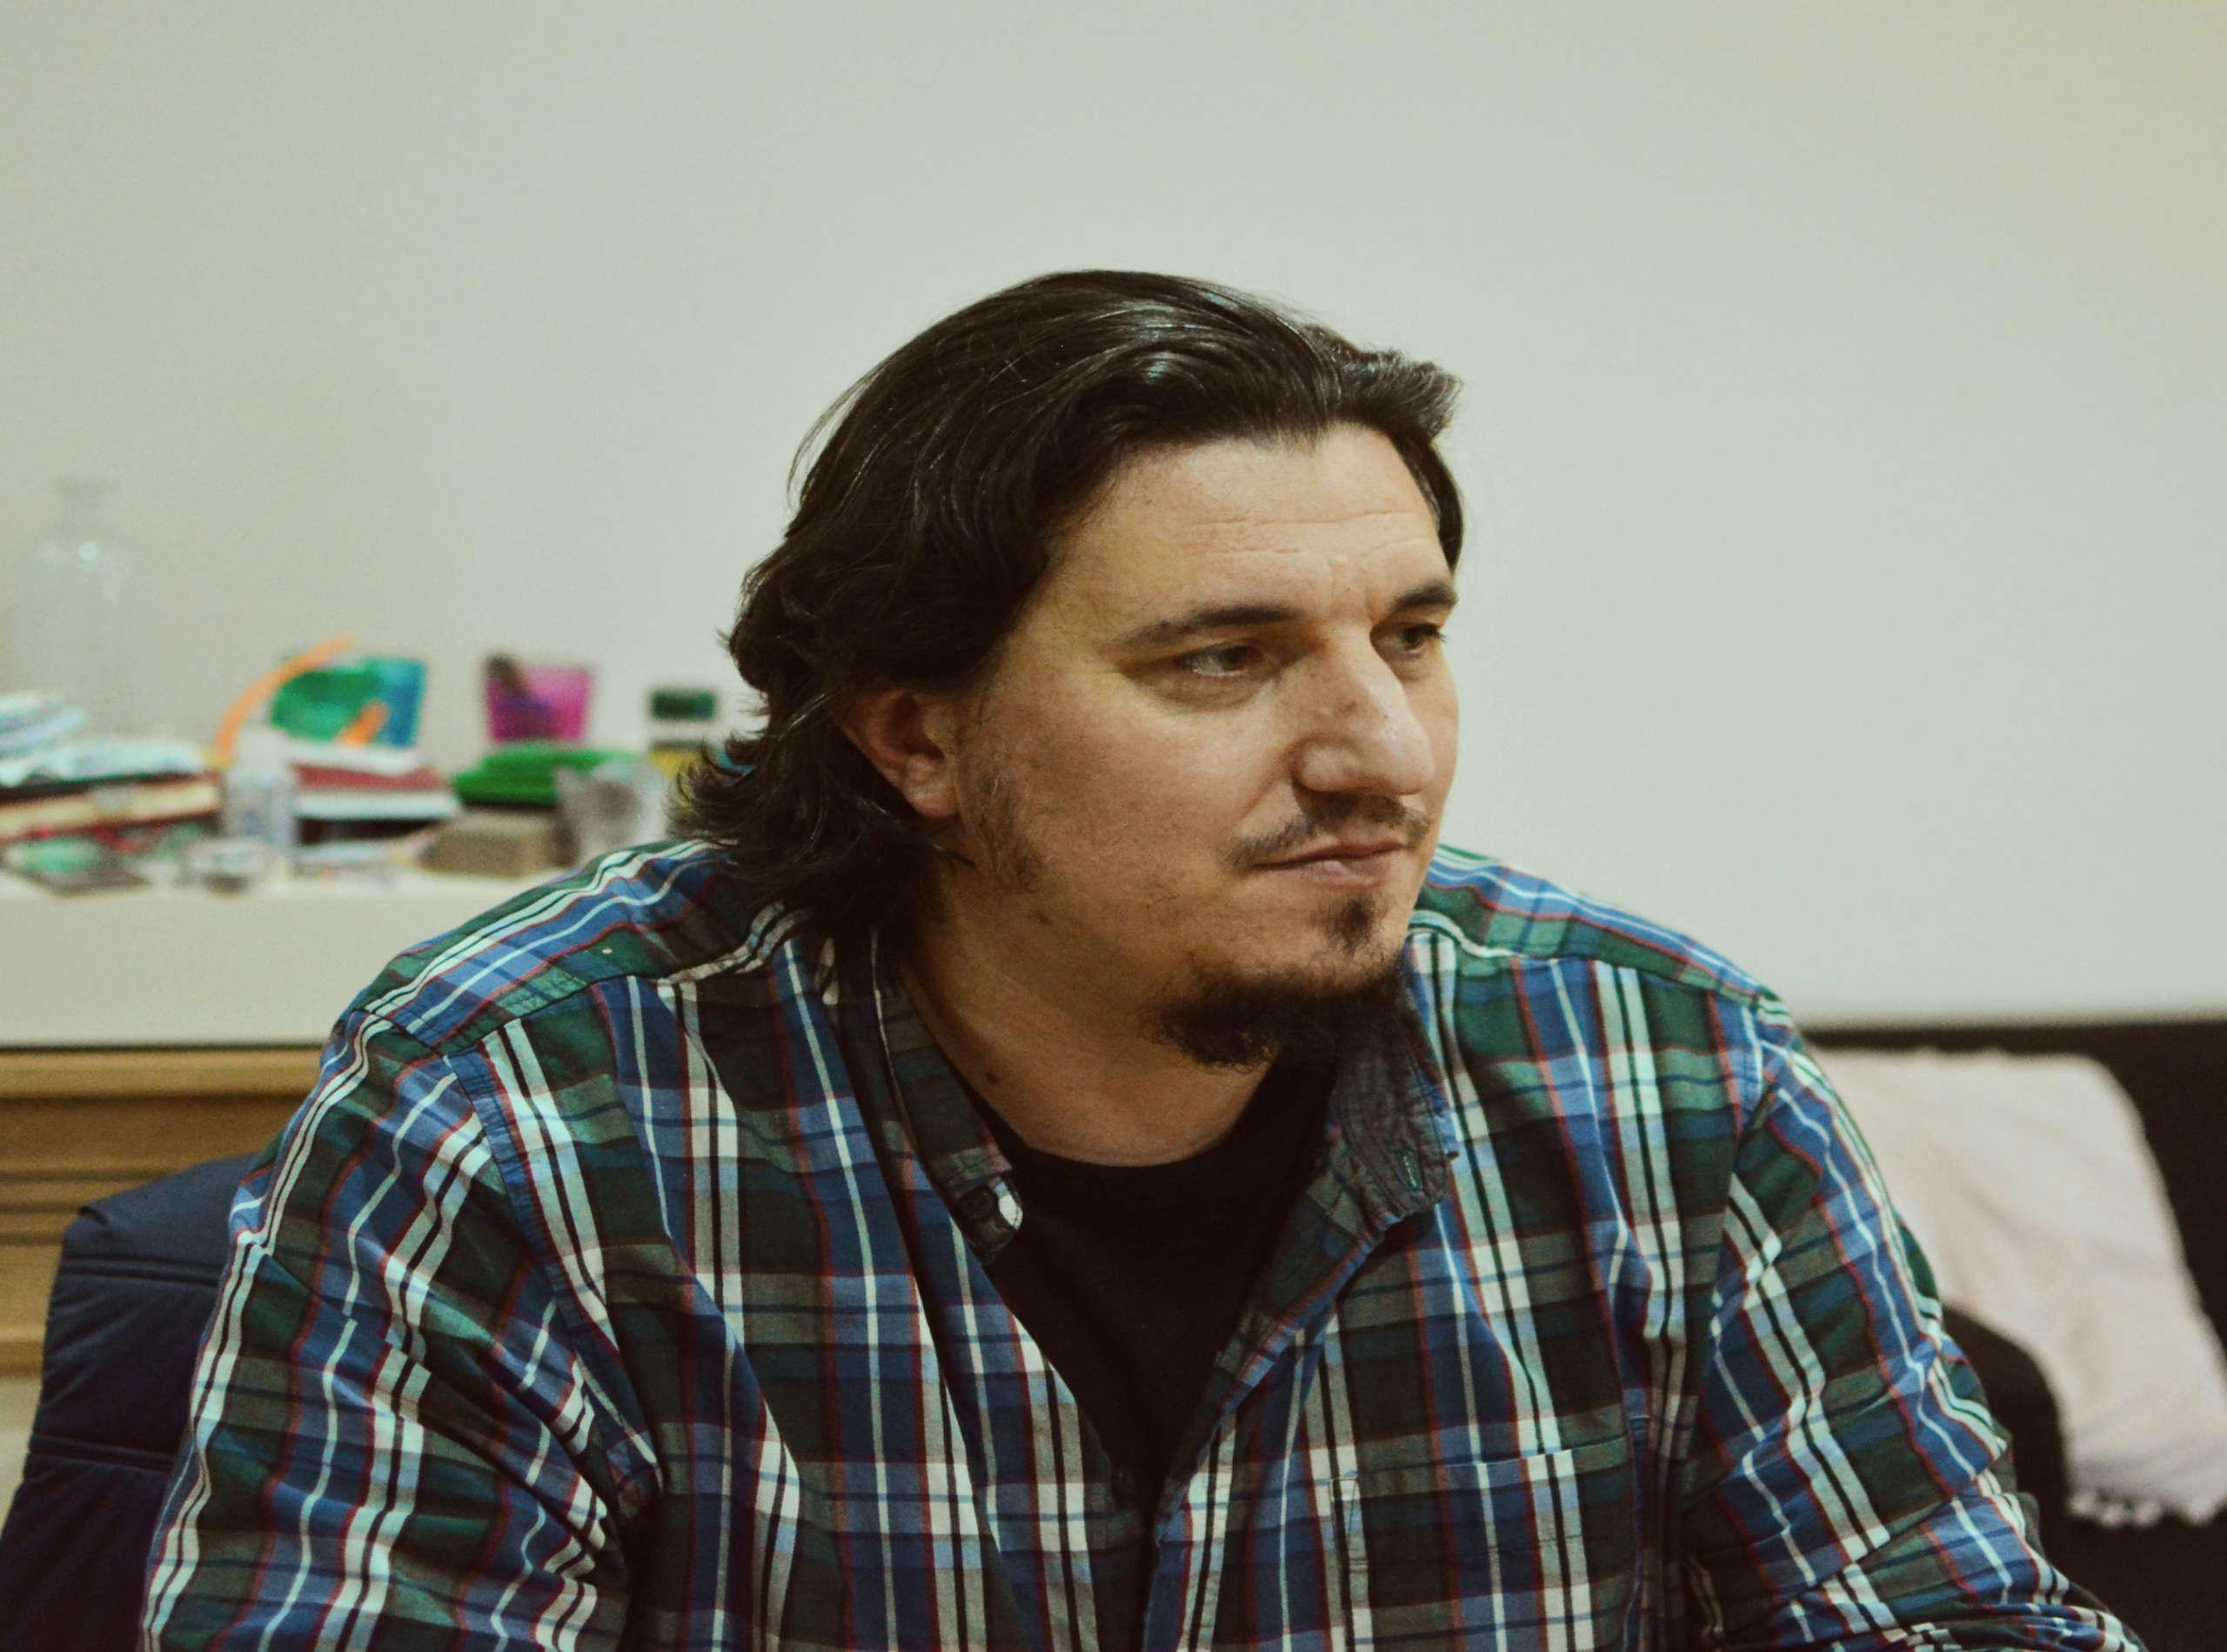 Entretien avec Abourayan Debreda part 1 : condamner pour rien